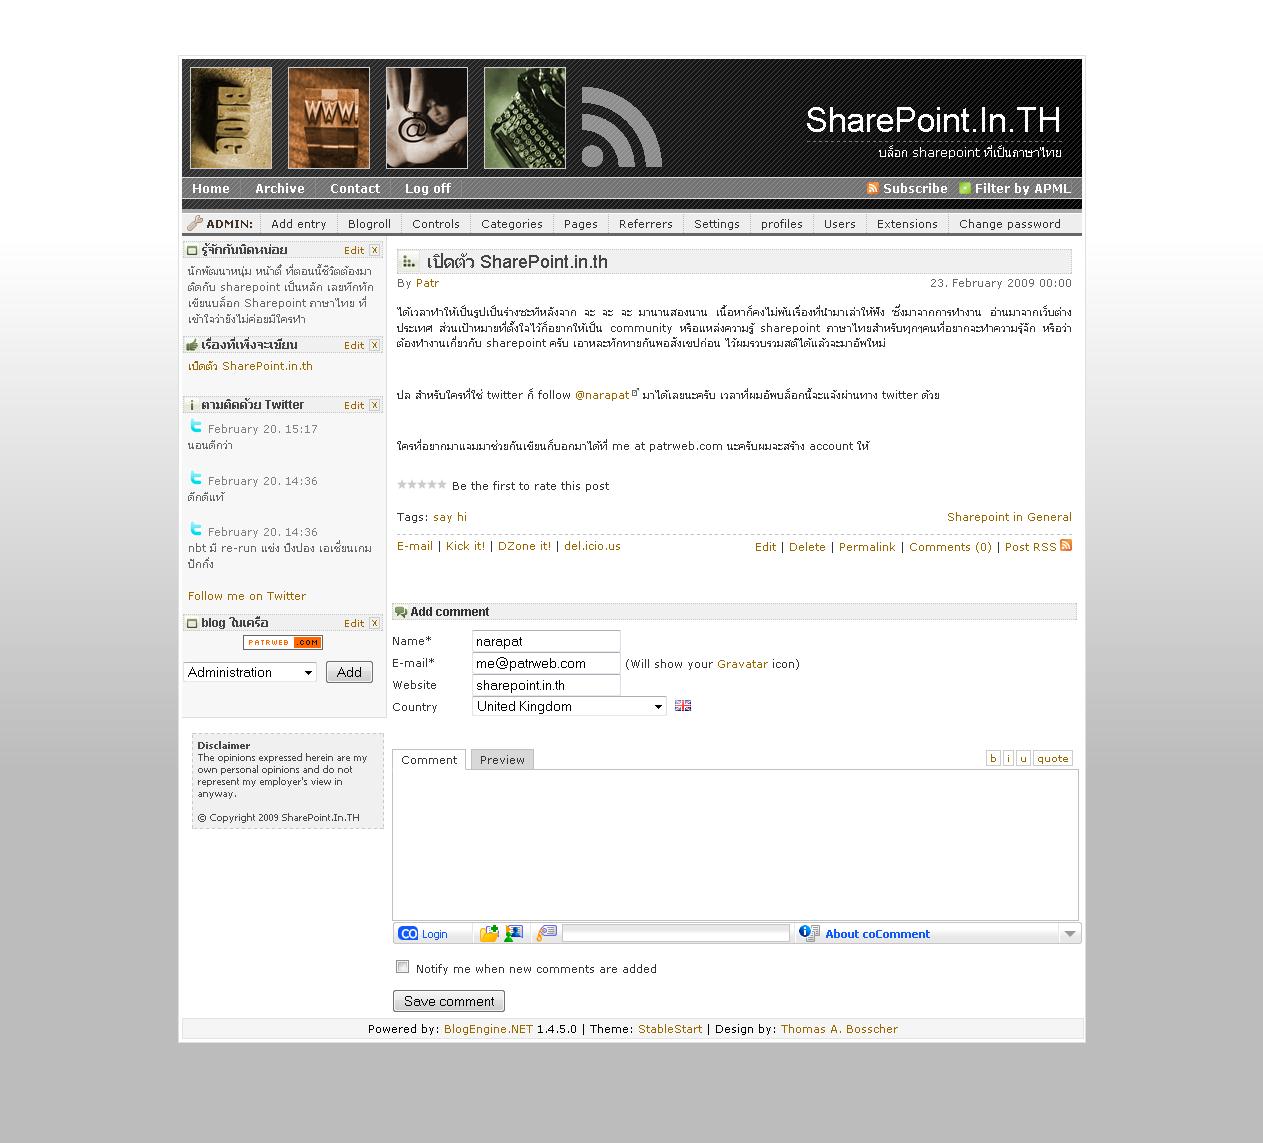 sharepoint_v1.png